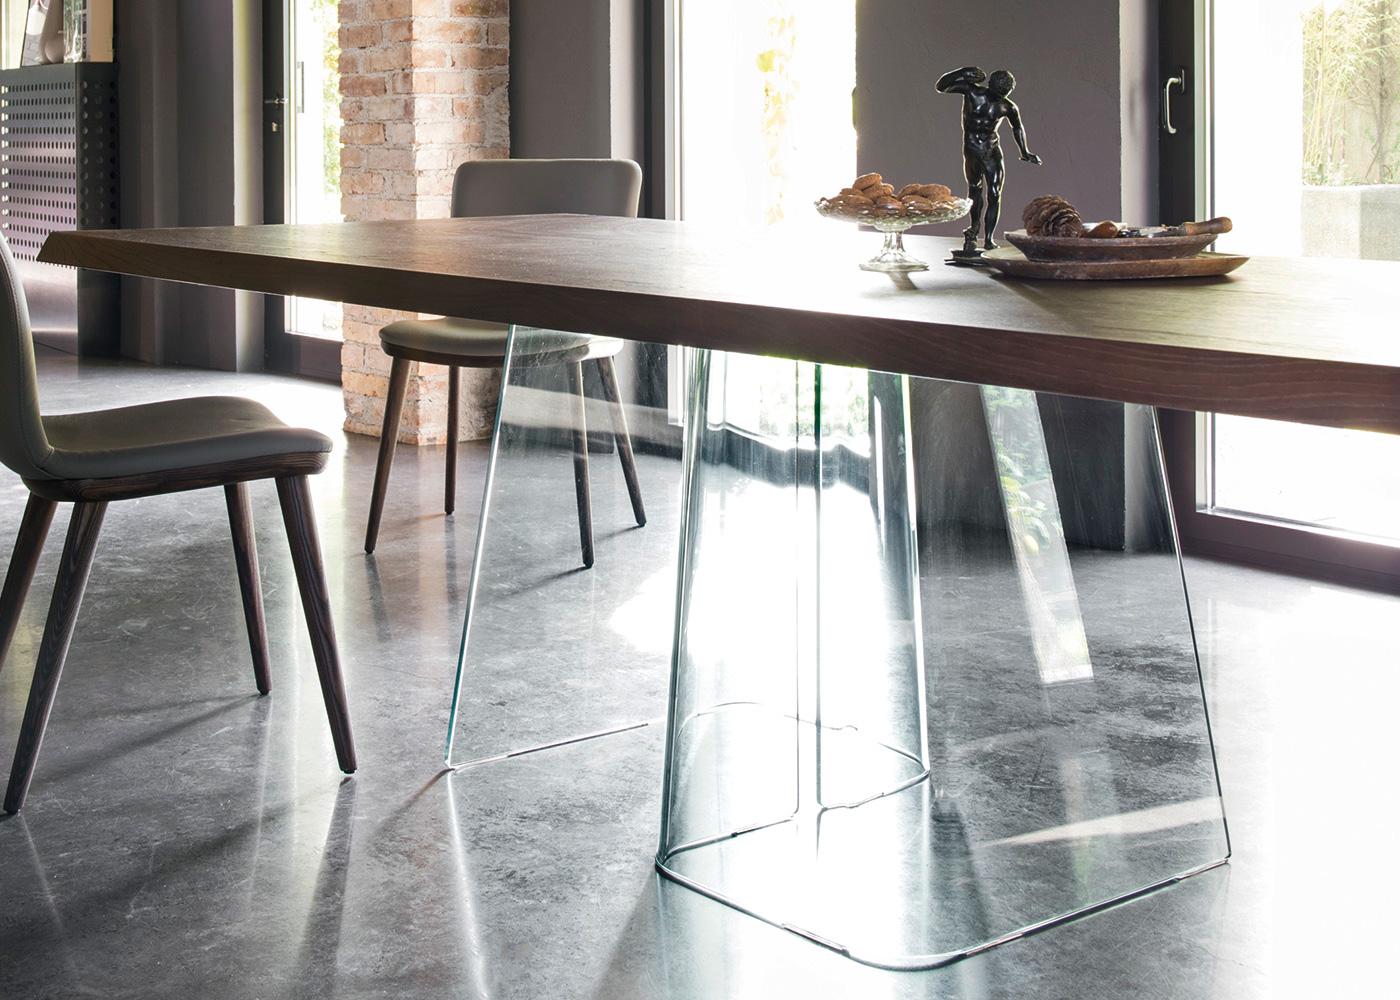 calligaris sofas uk velvet modular sofa volo table midfurn furniture superstore